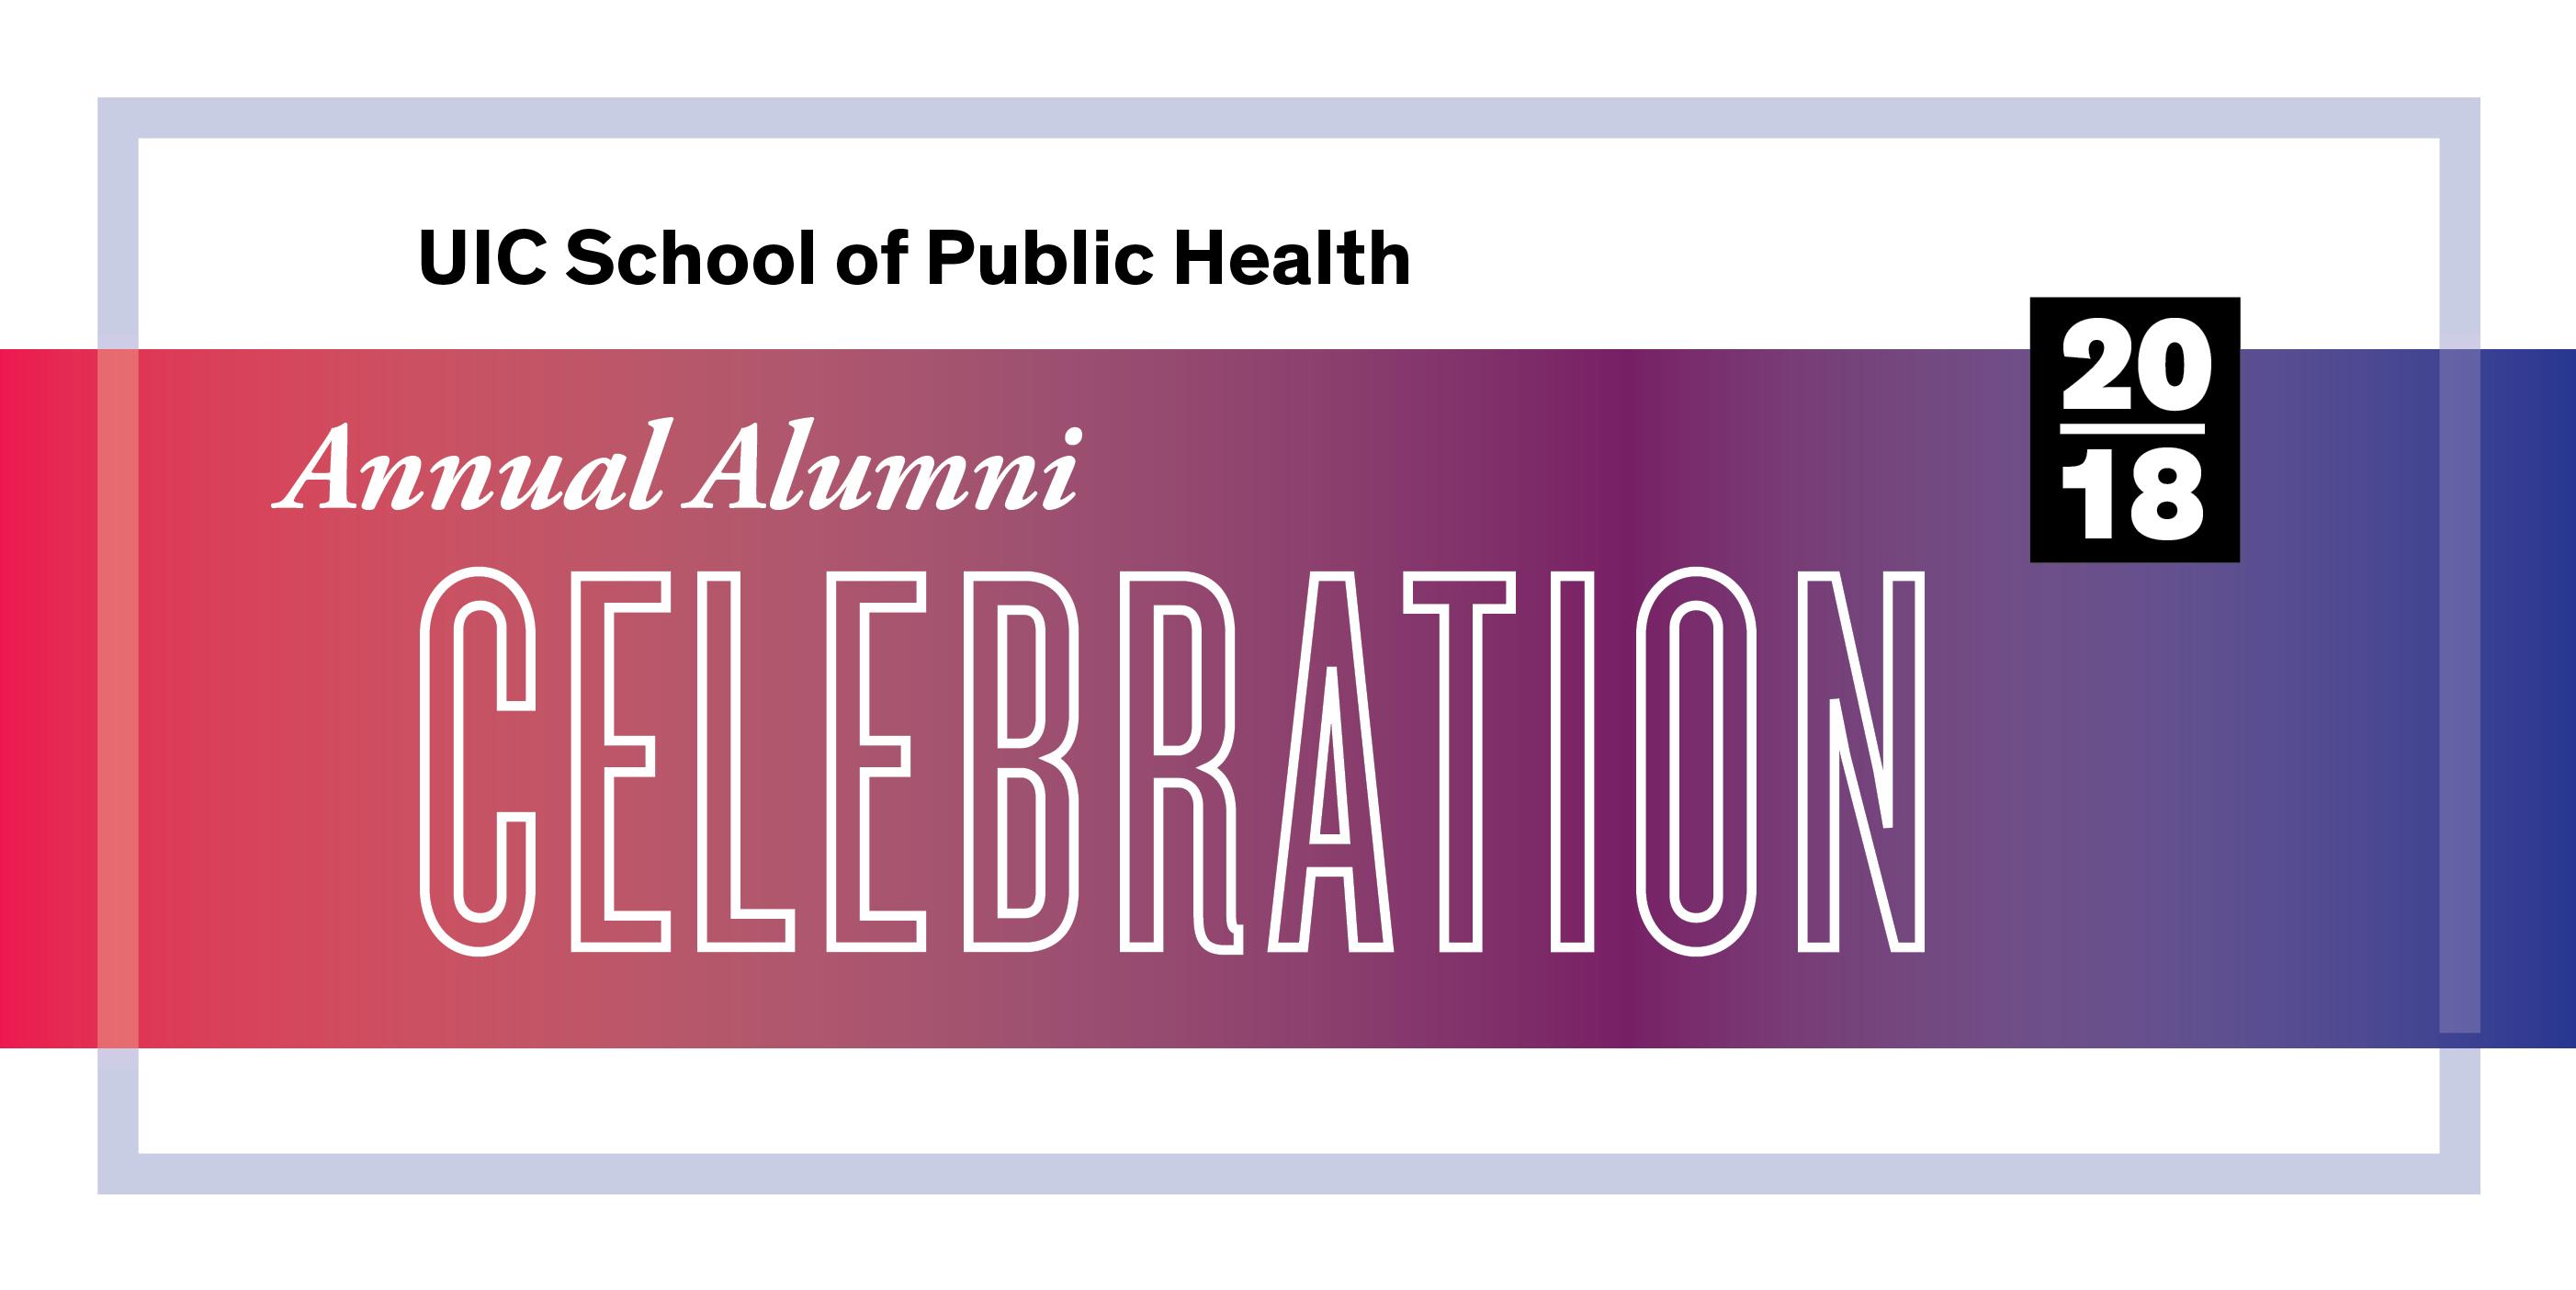 UIC School of Public Health Annual Alumni Celebration 2018